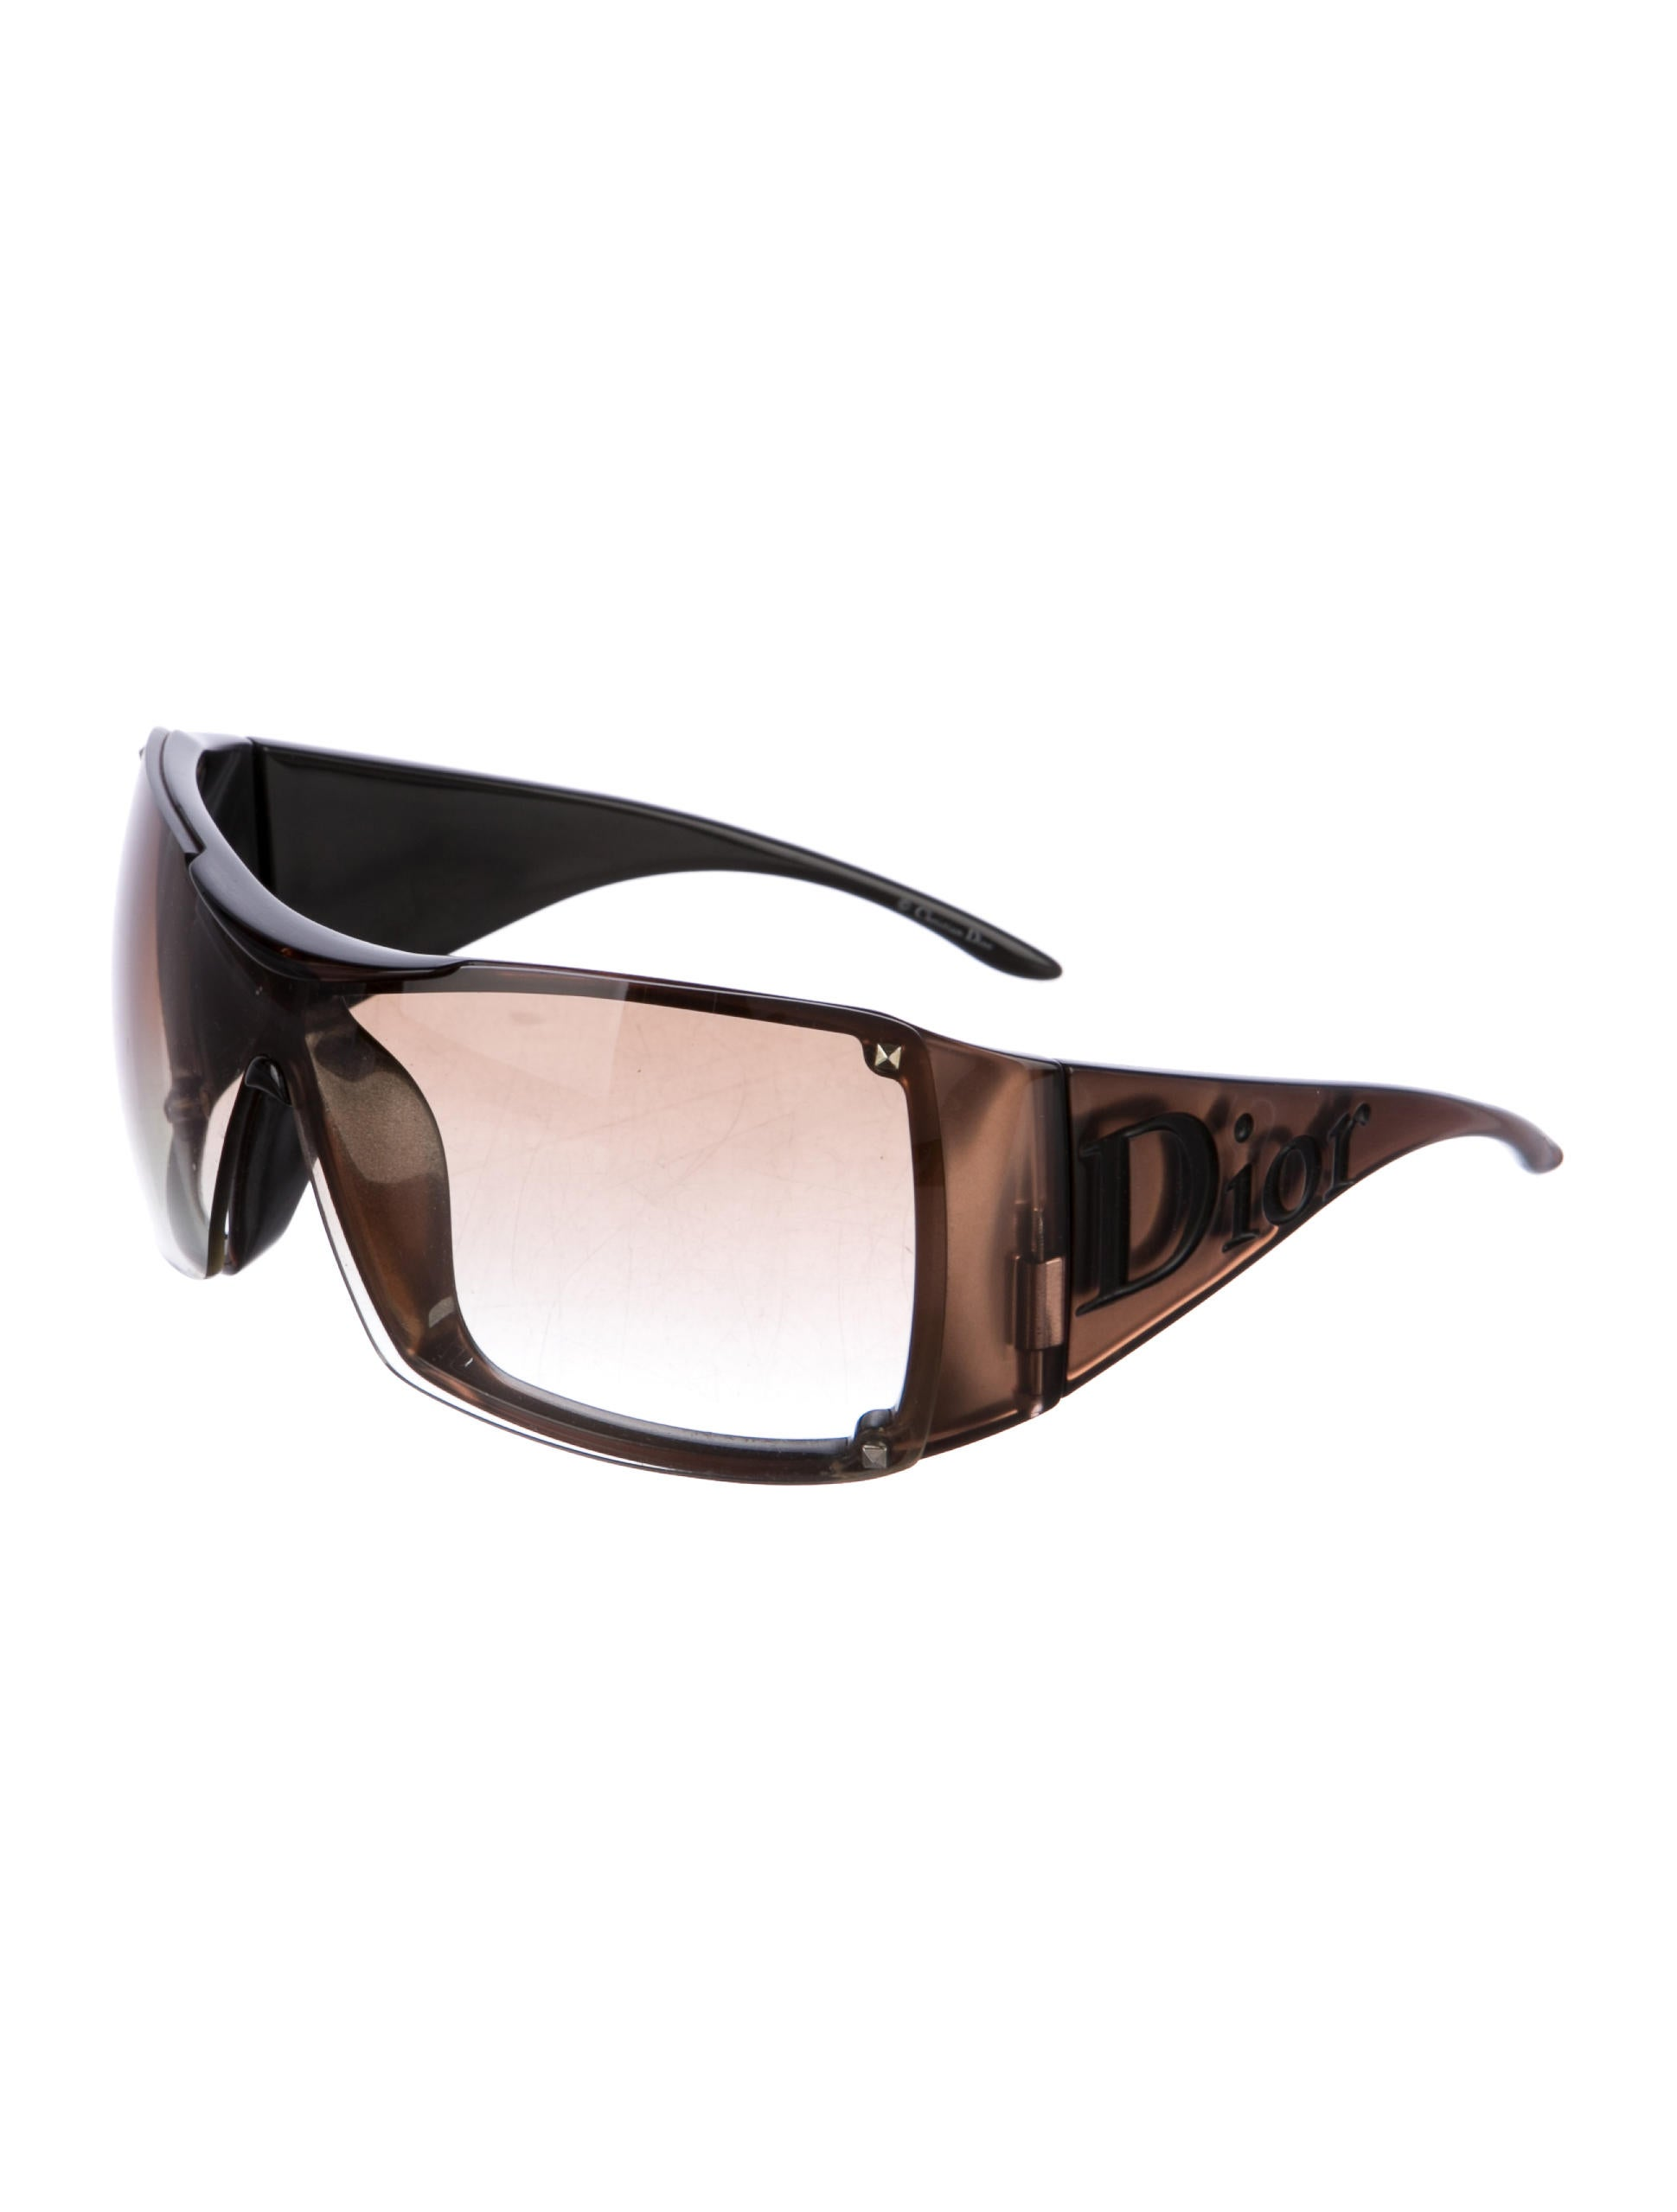 2038cc98d2e Dior So Real Studded Sunglasses - Bitterroot Public Library